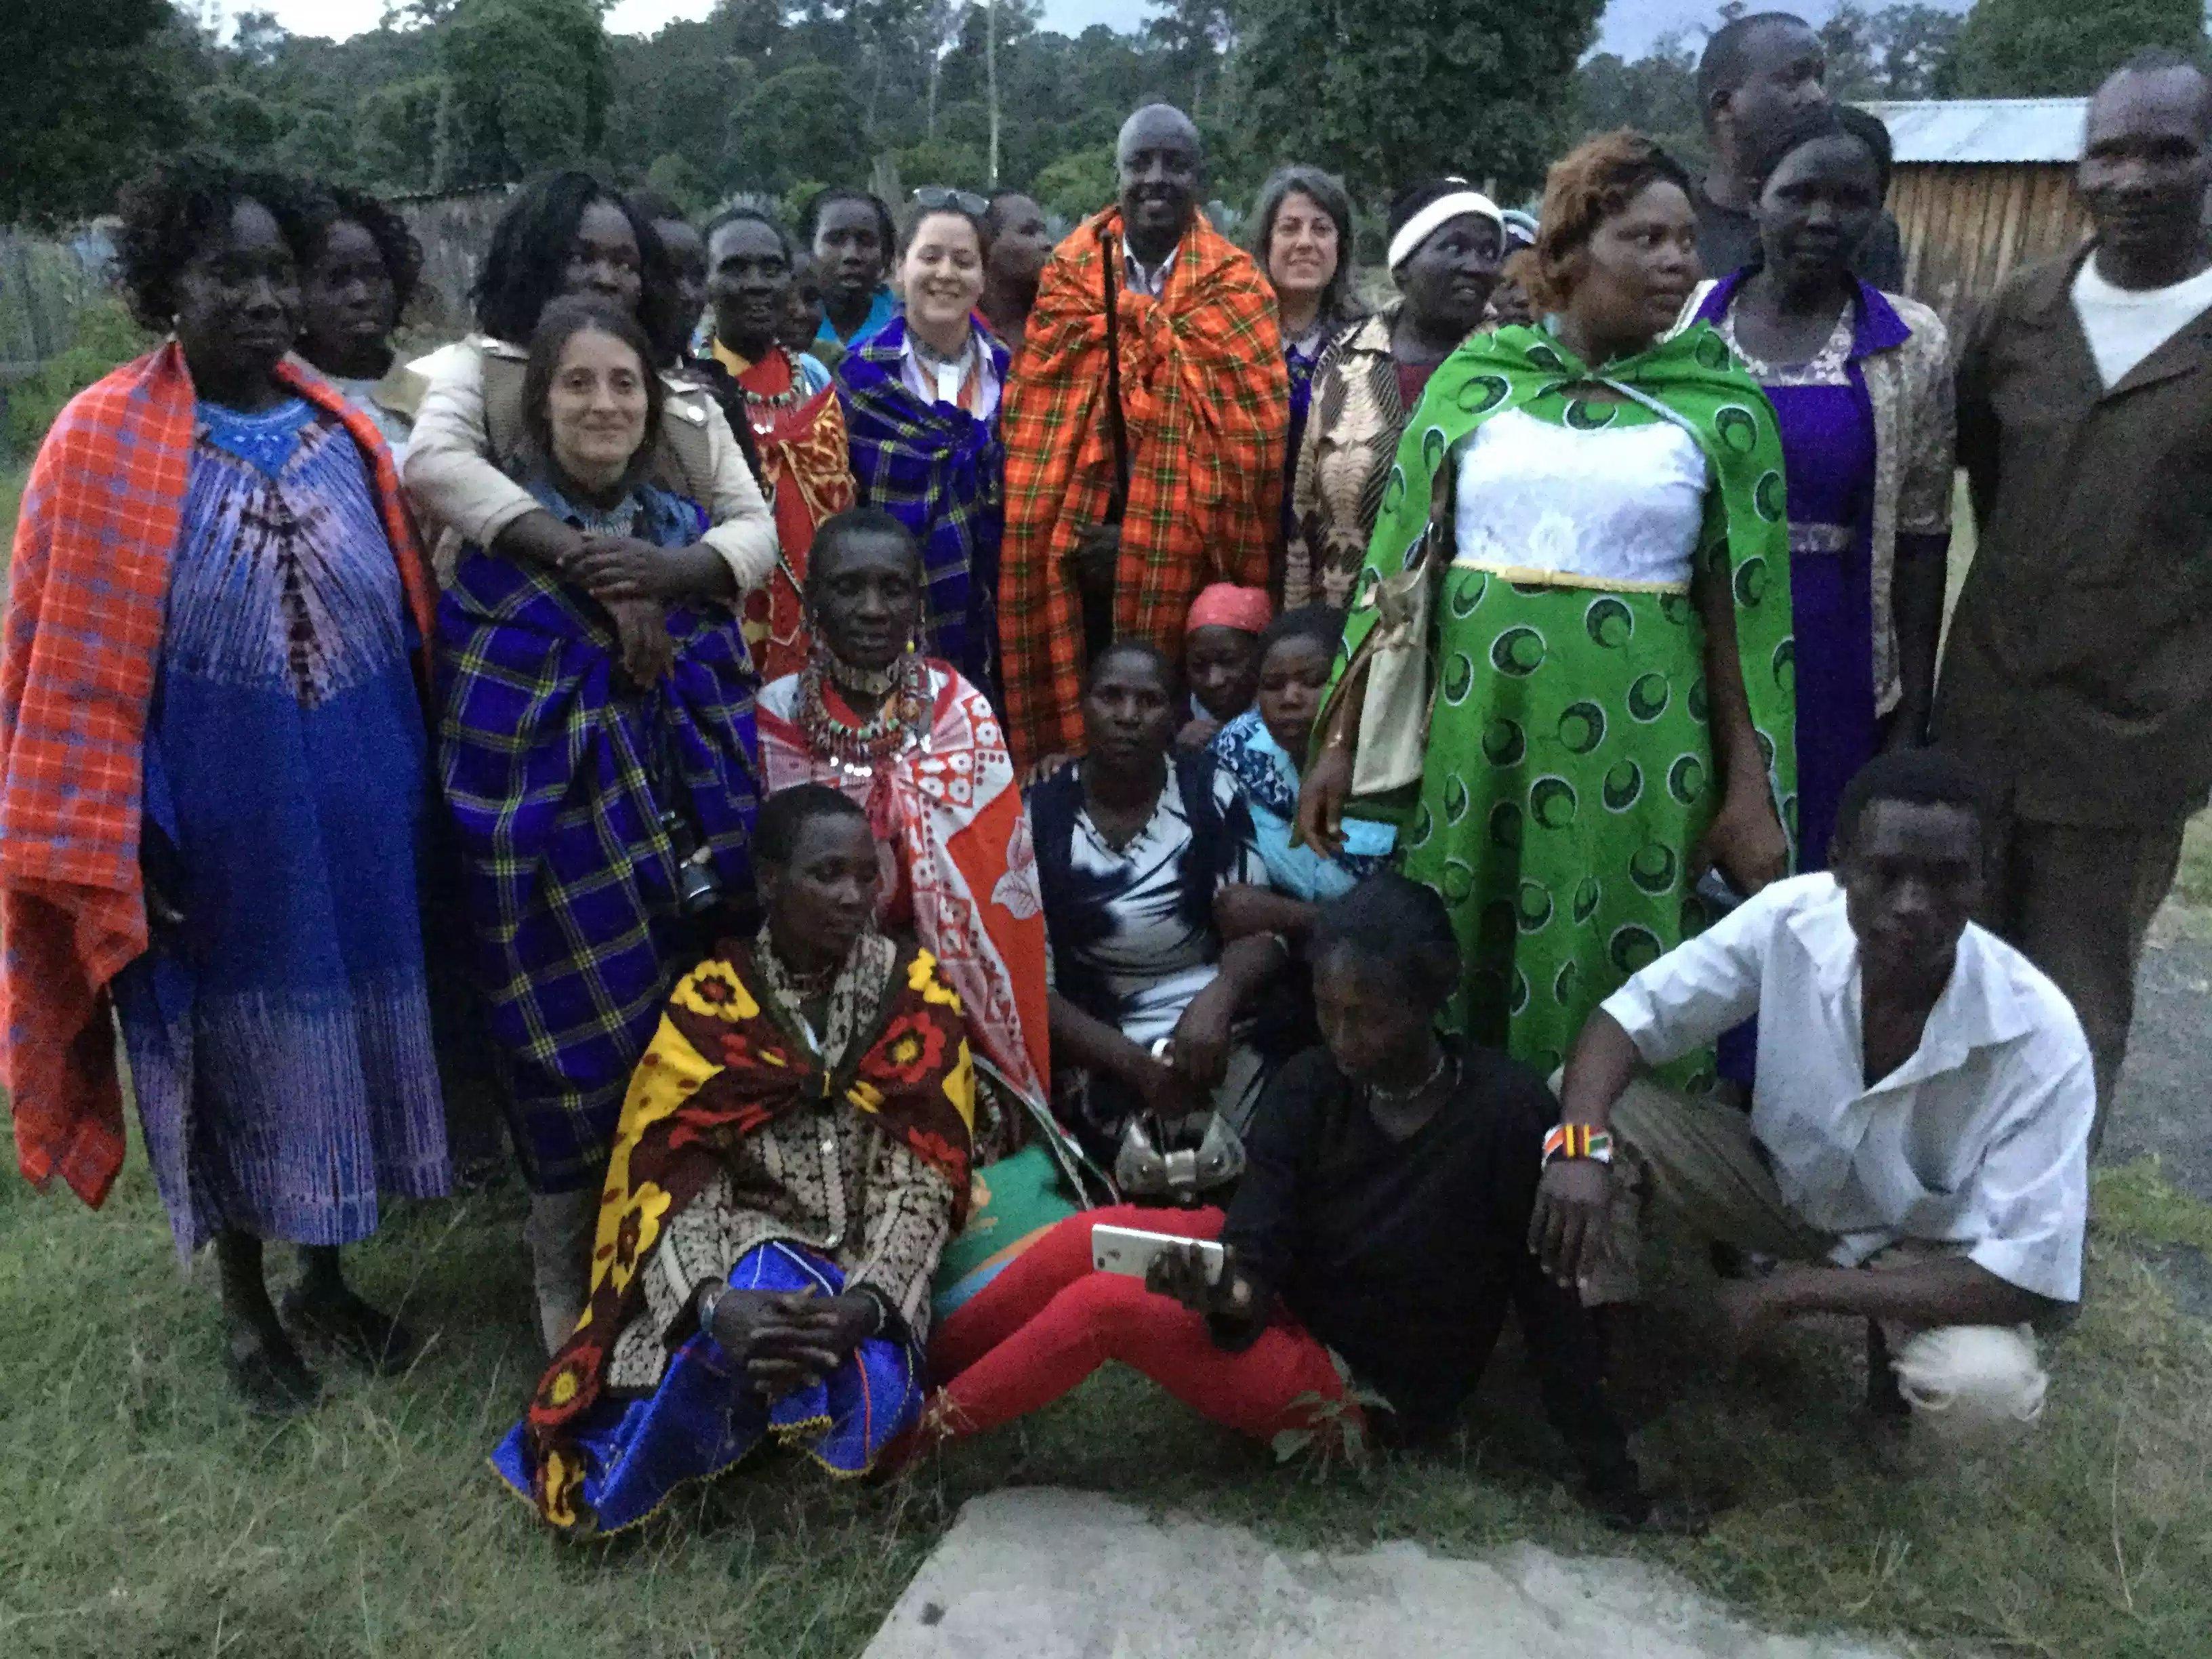 http://indigenouswomen-africa.org/wp-content/uploads/2018/03/image-33055.jpeg